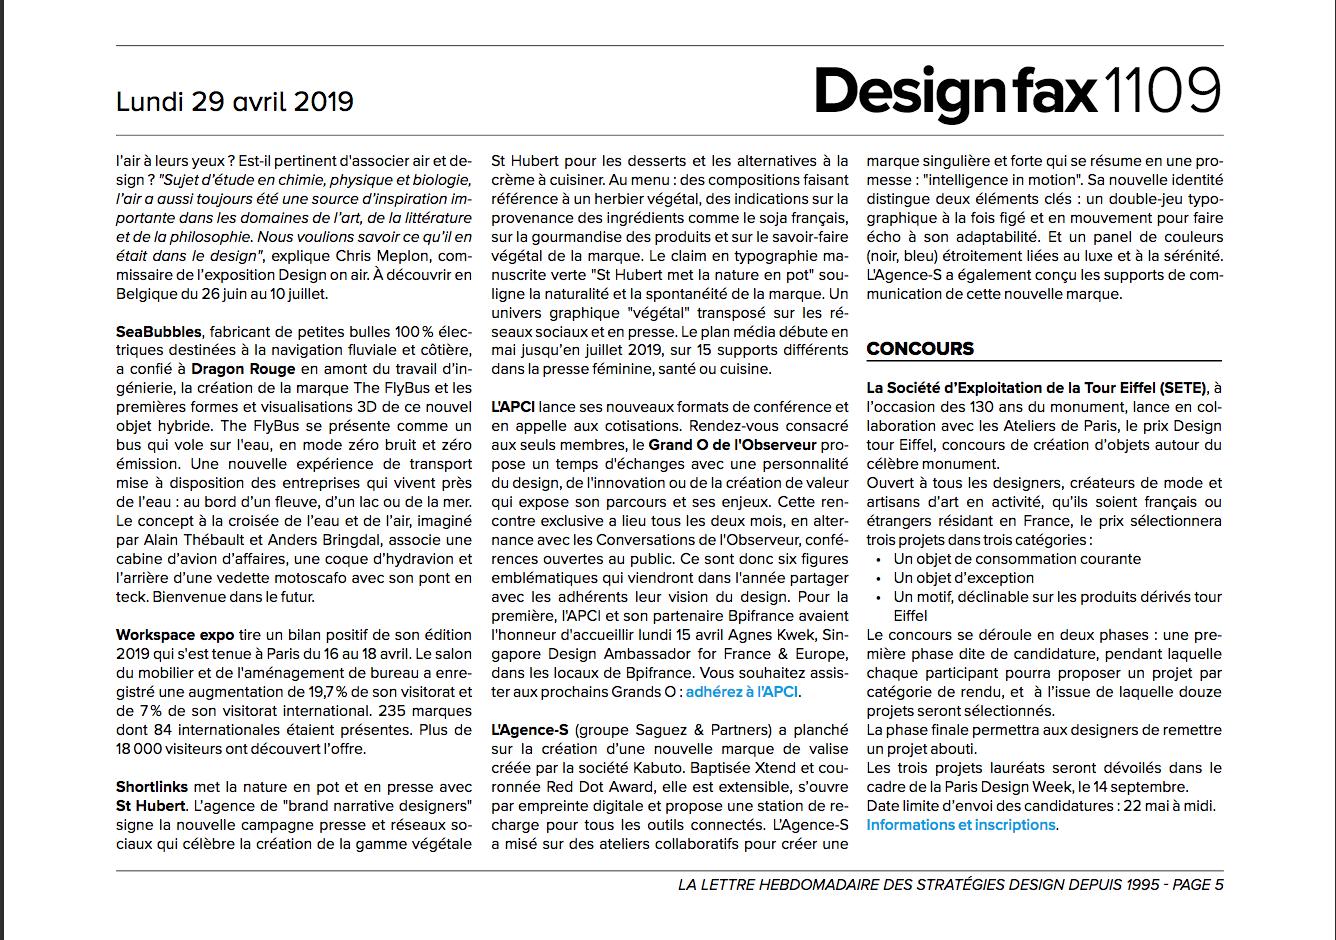 agence-s-design-fax-innovation